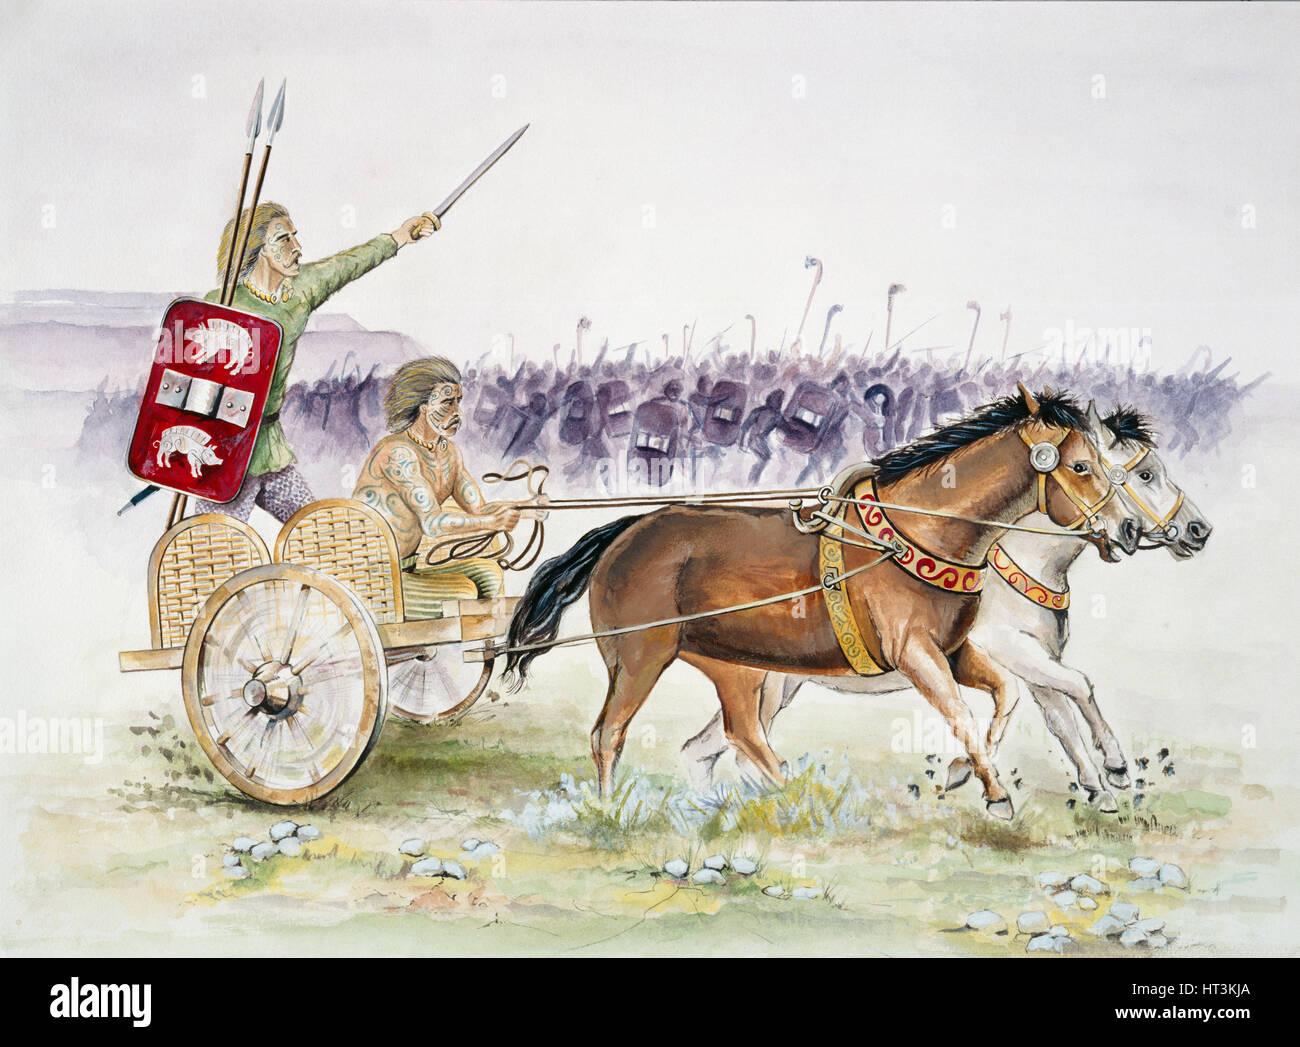 Celtic chariot, Iron Age, (c1990-2010) Artist: Jeremy Richards. Stock Photo